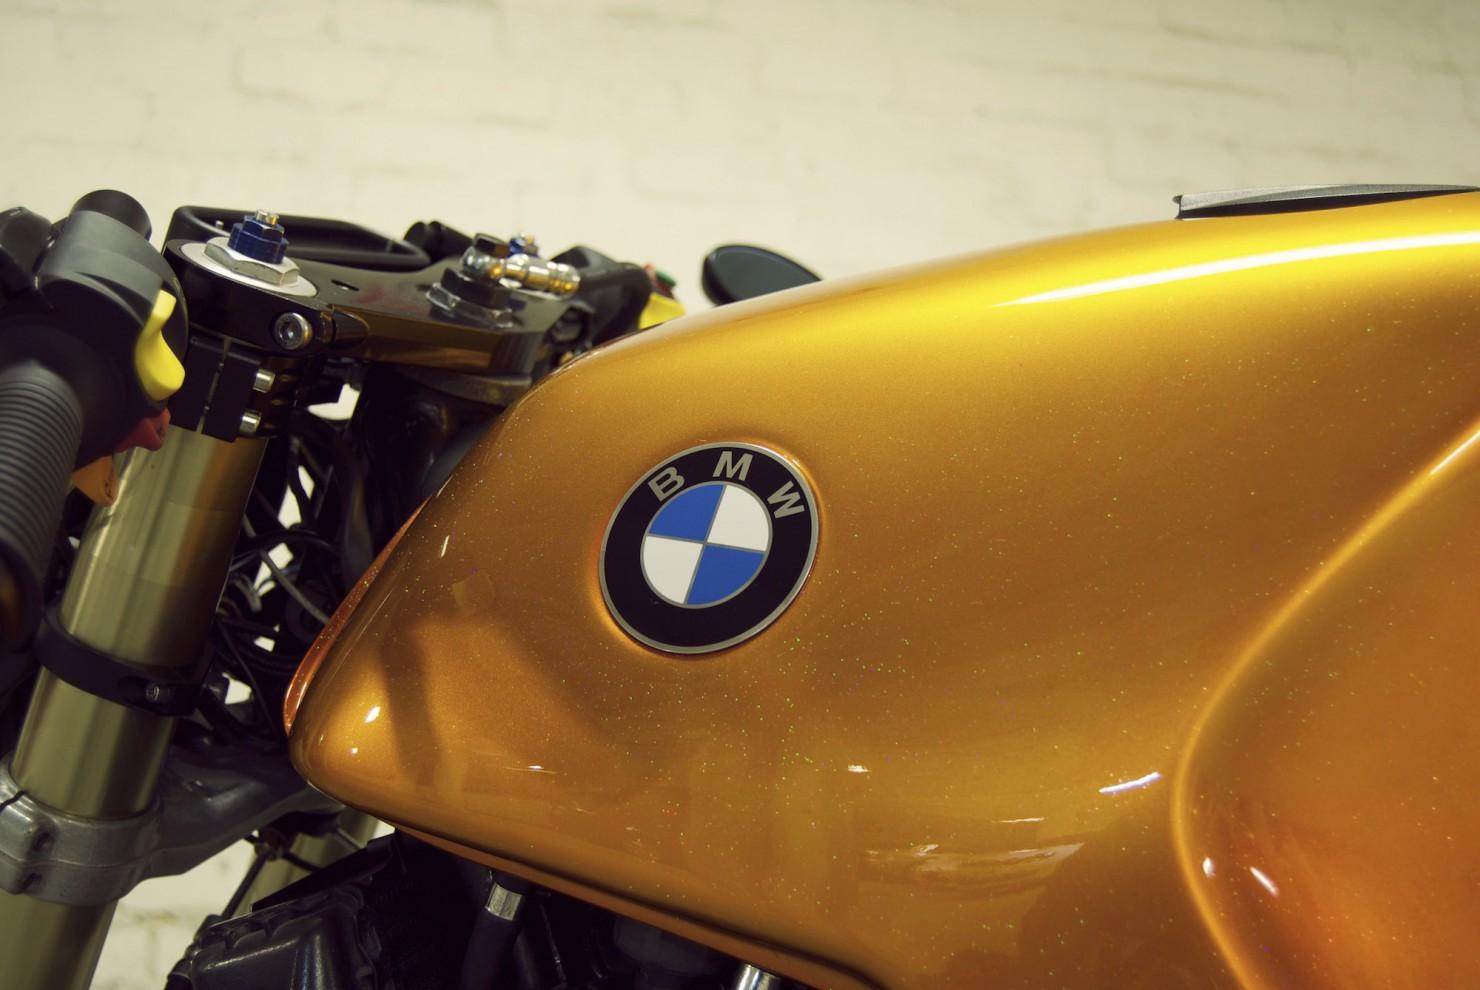 BMW K100 Motorcycle 16